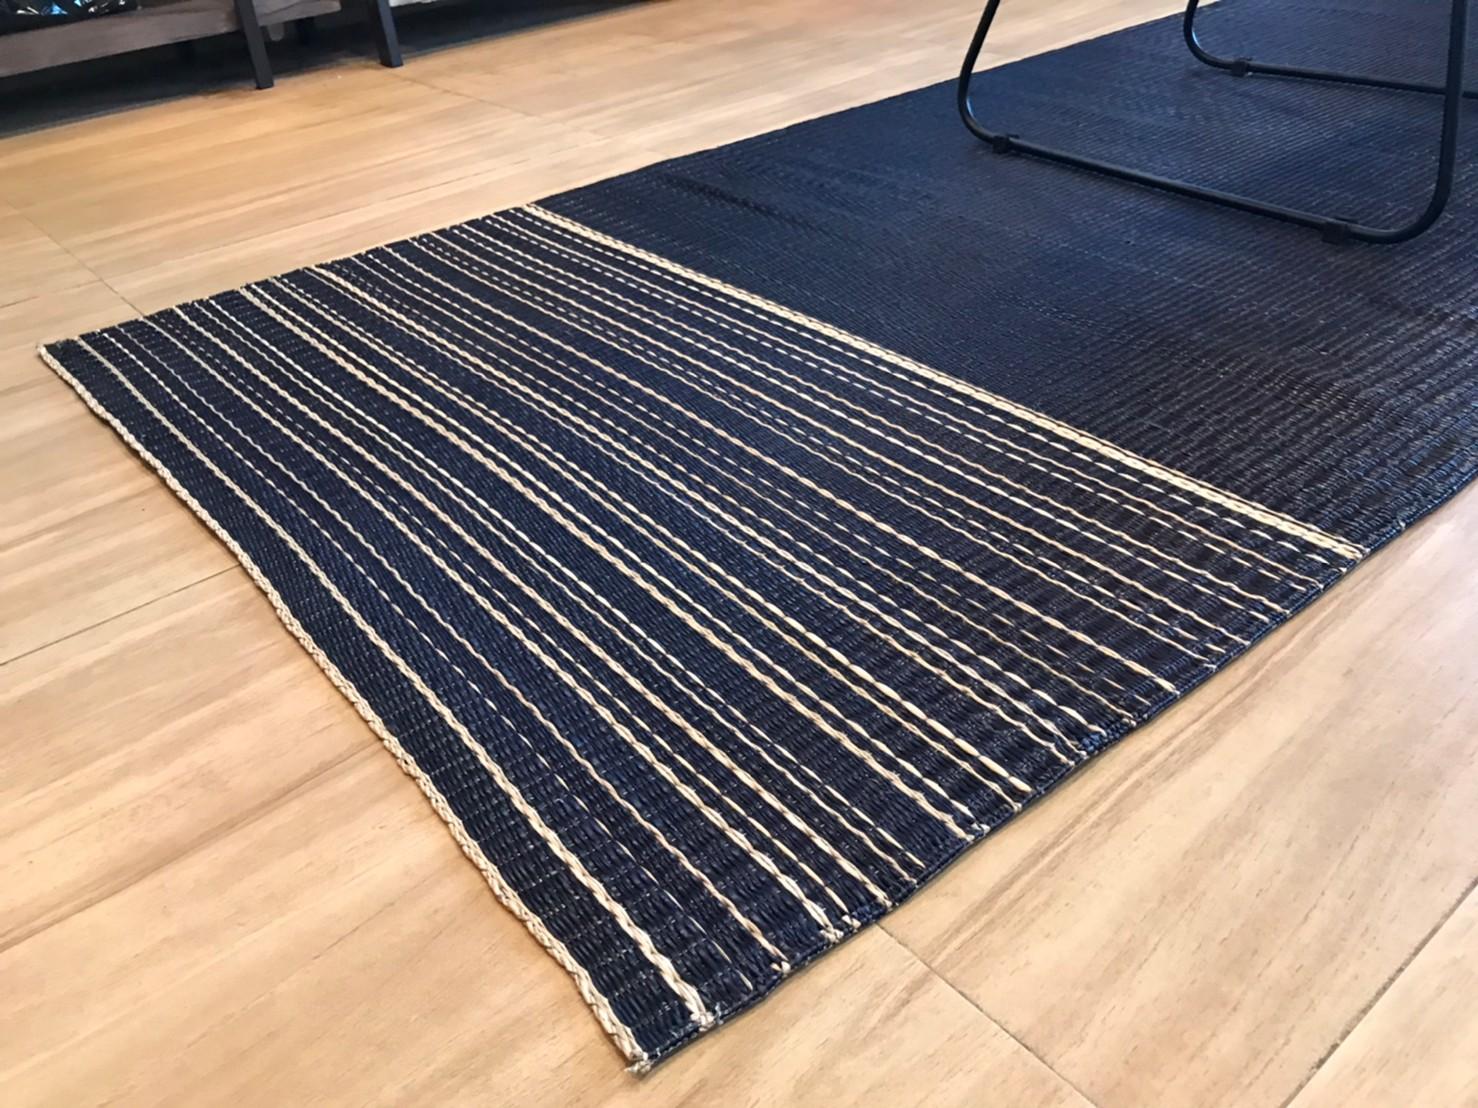 Saifon mat Black